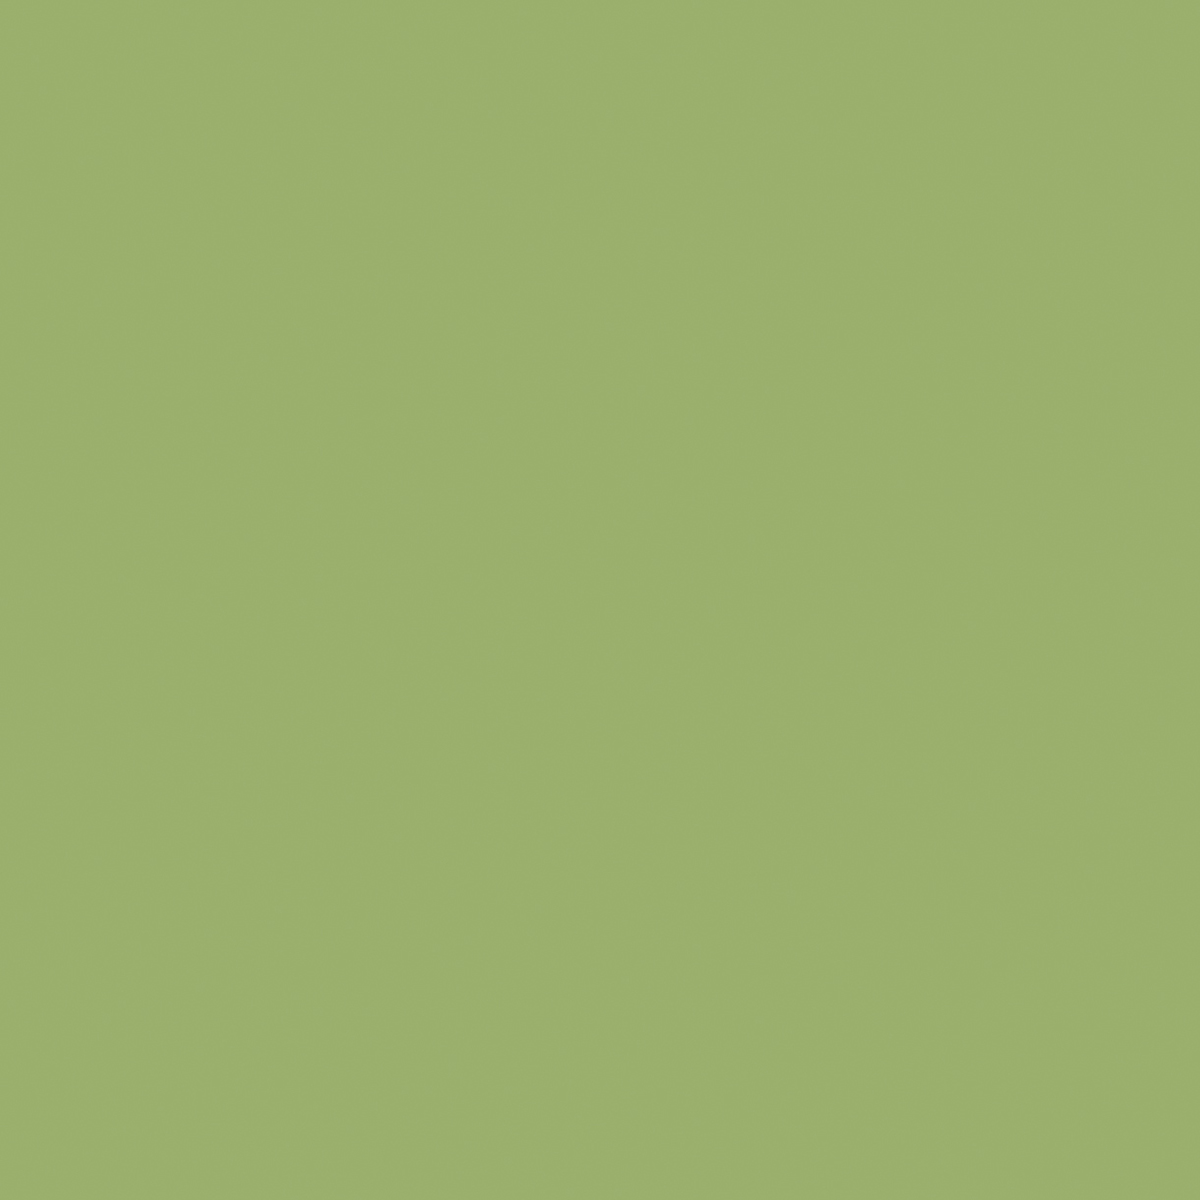 8820 Leaf Green - Formica